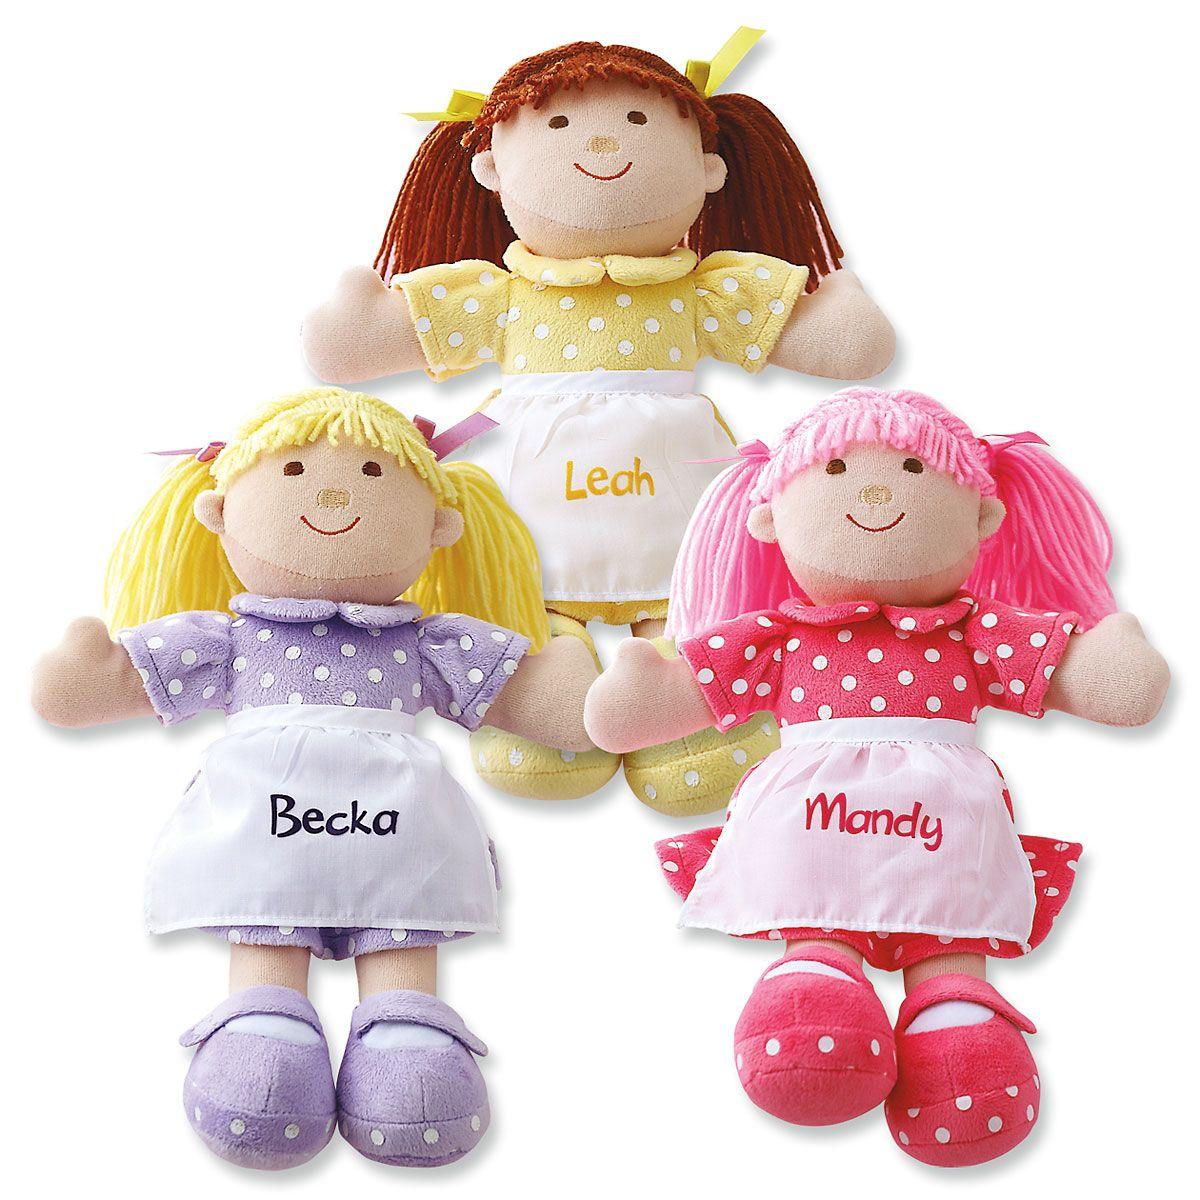 Cuddly Soft Personalized Dolls